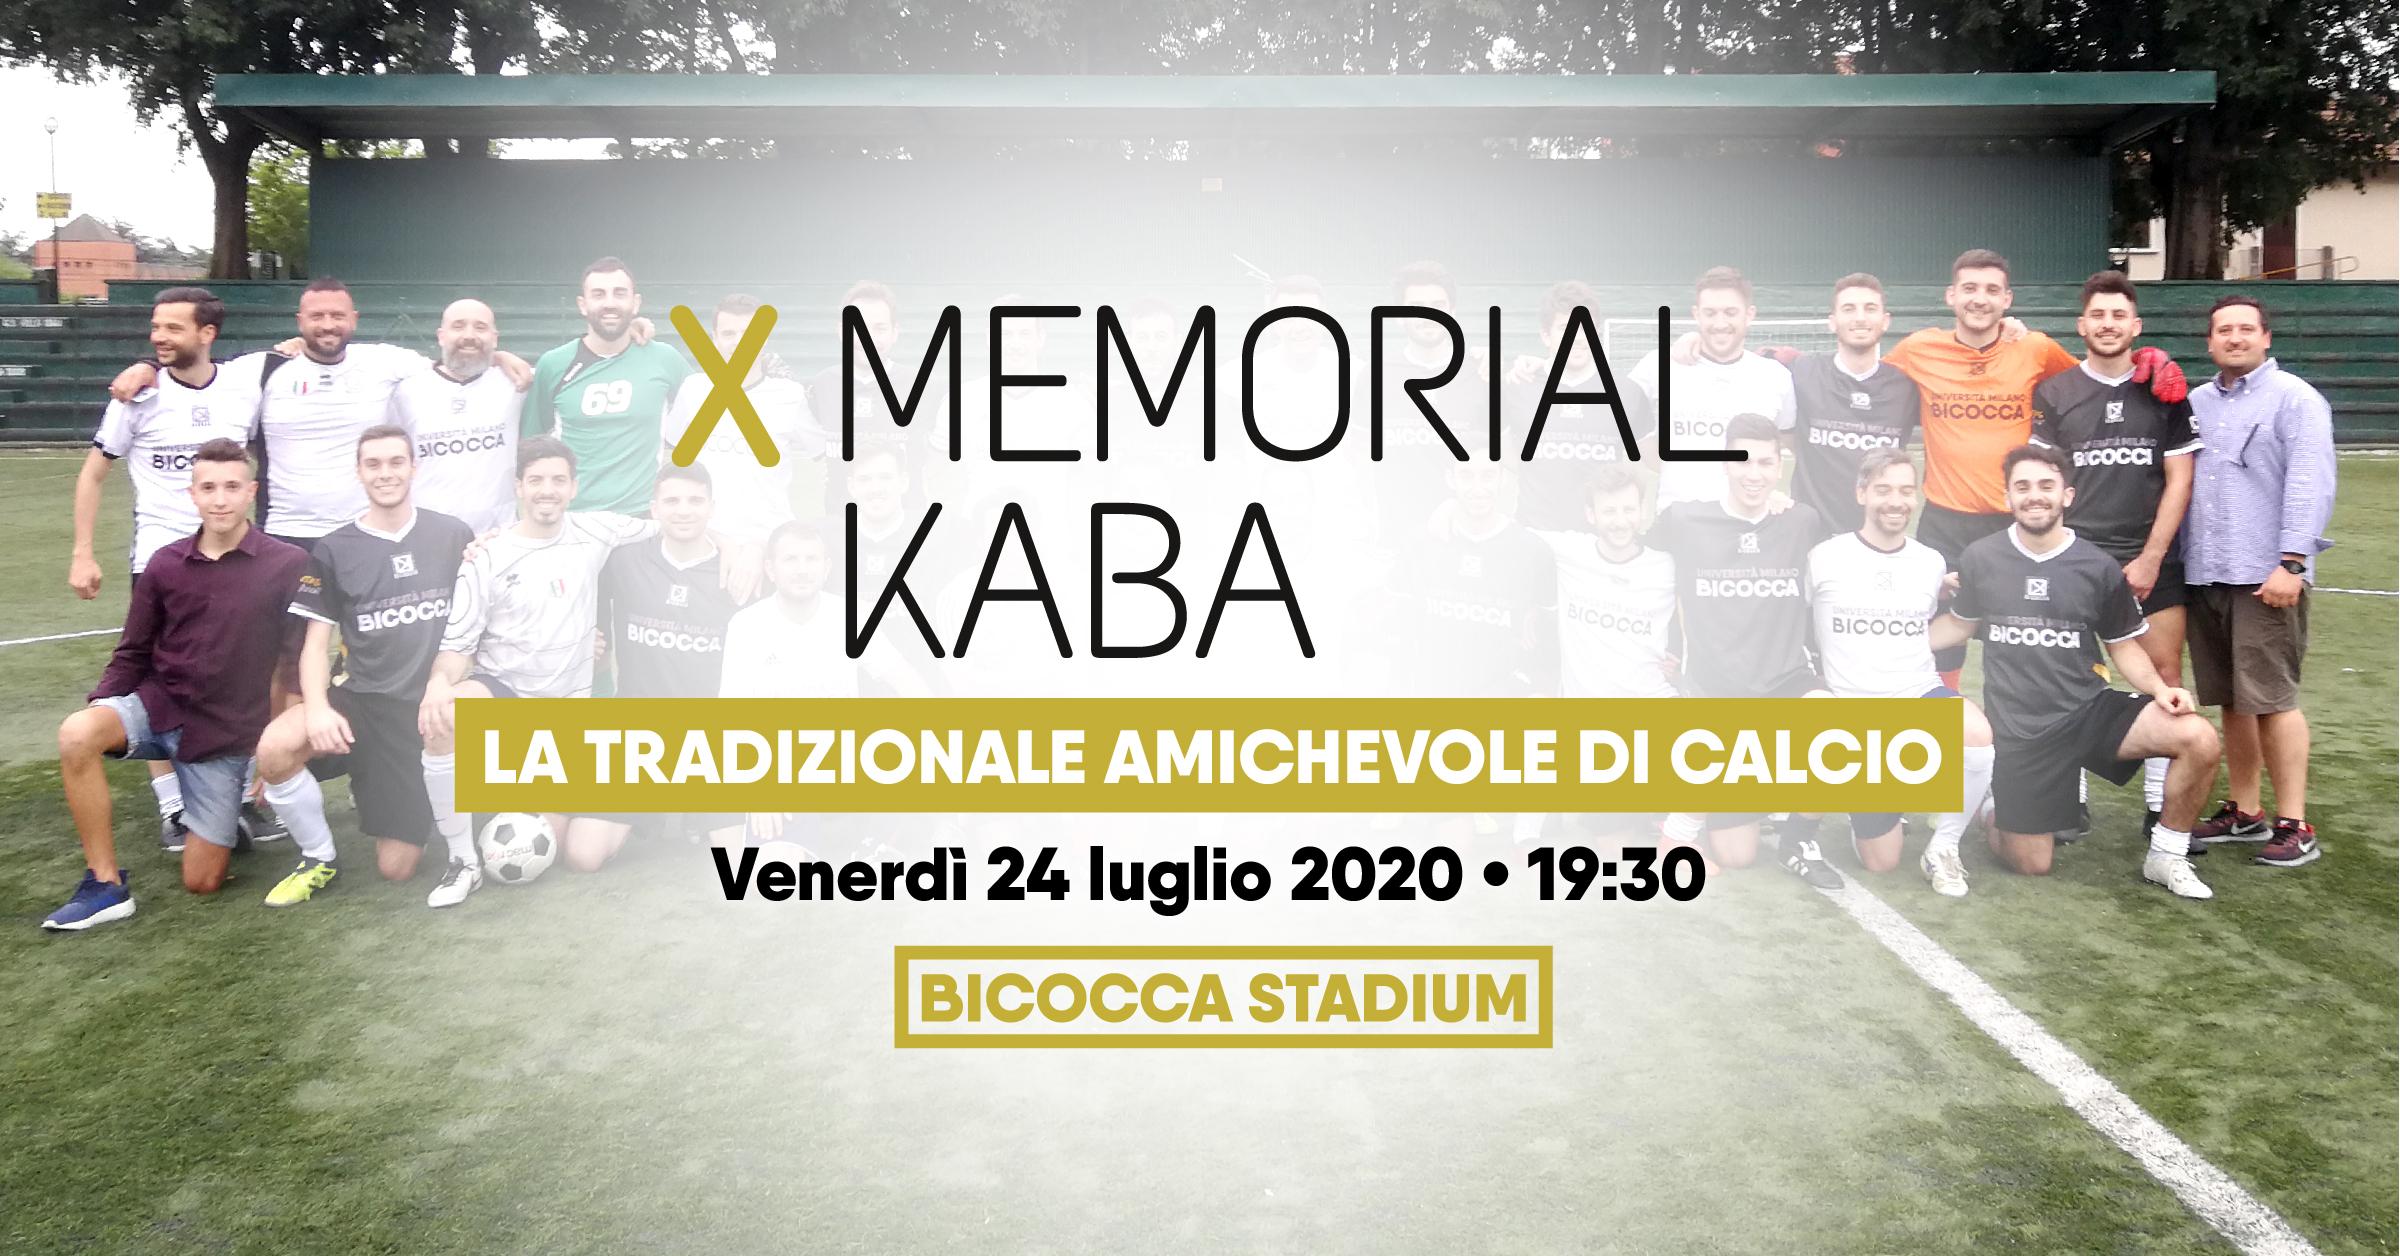 X Memorial Kaba • 24/07/2020 • CUS Bicocca